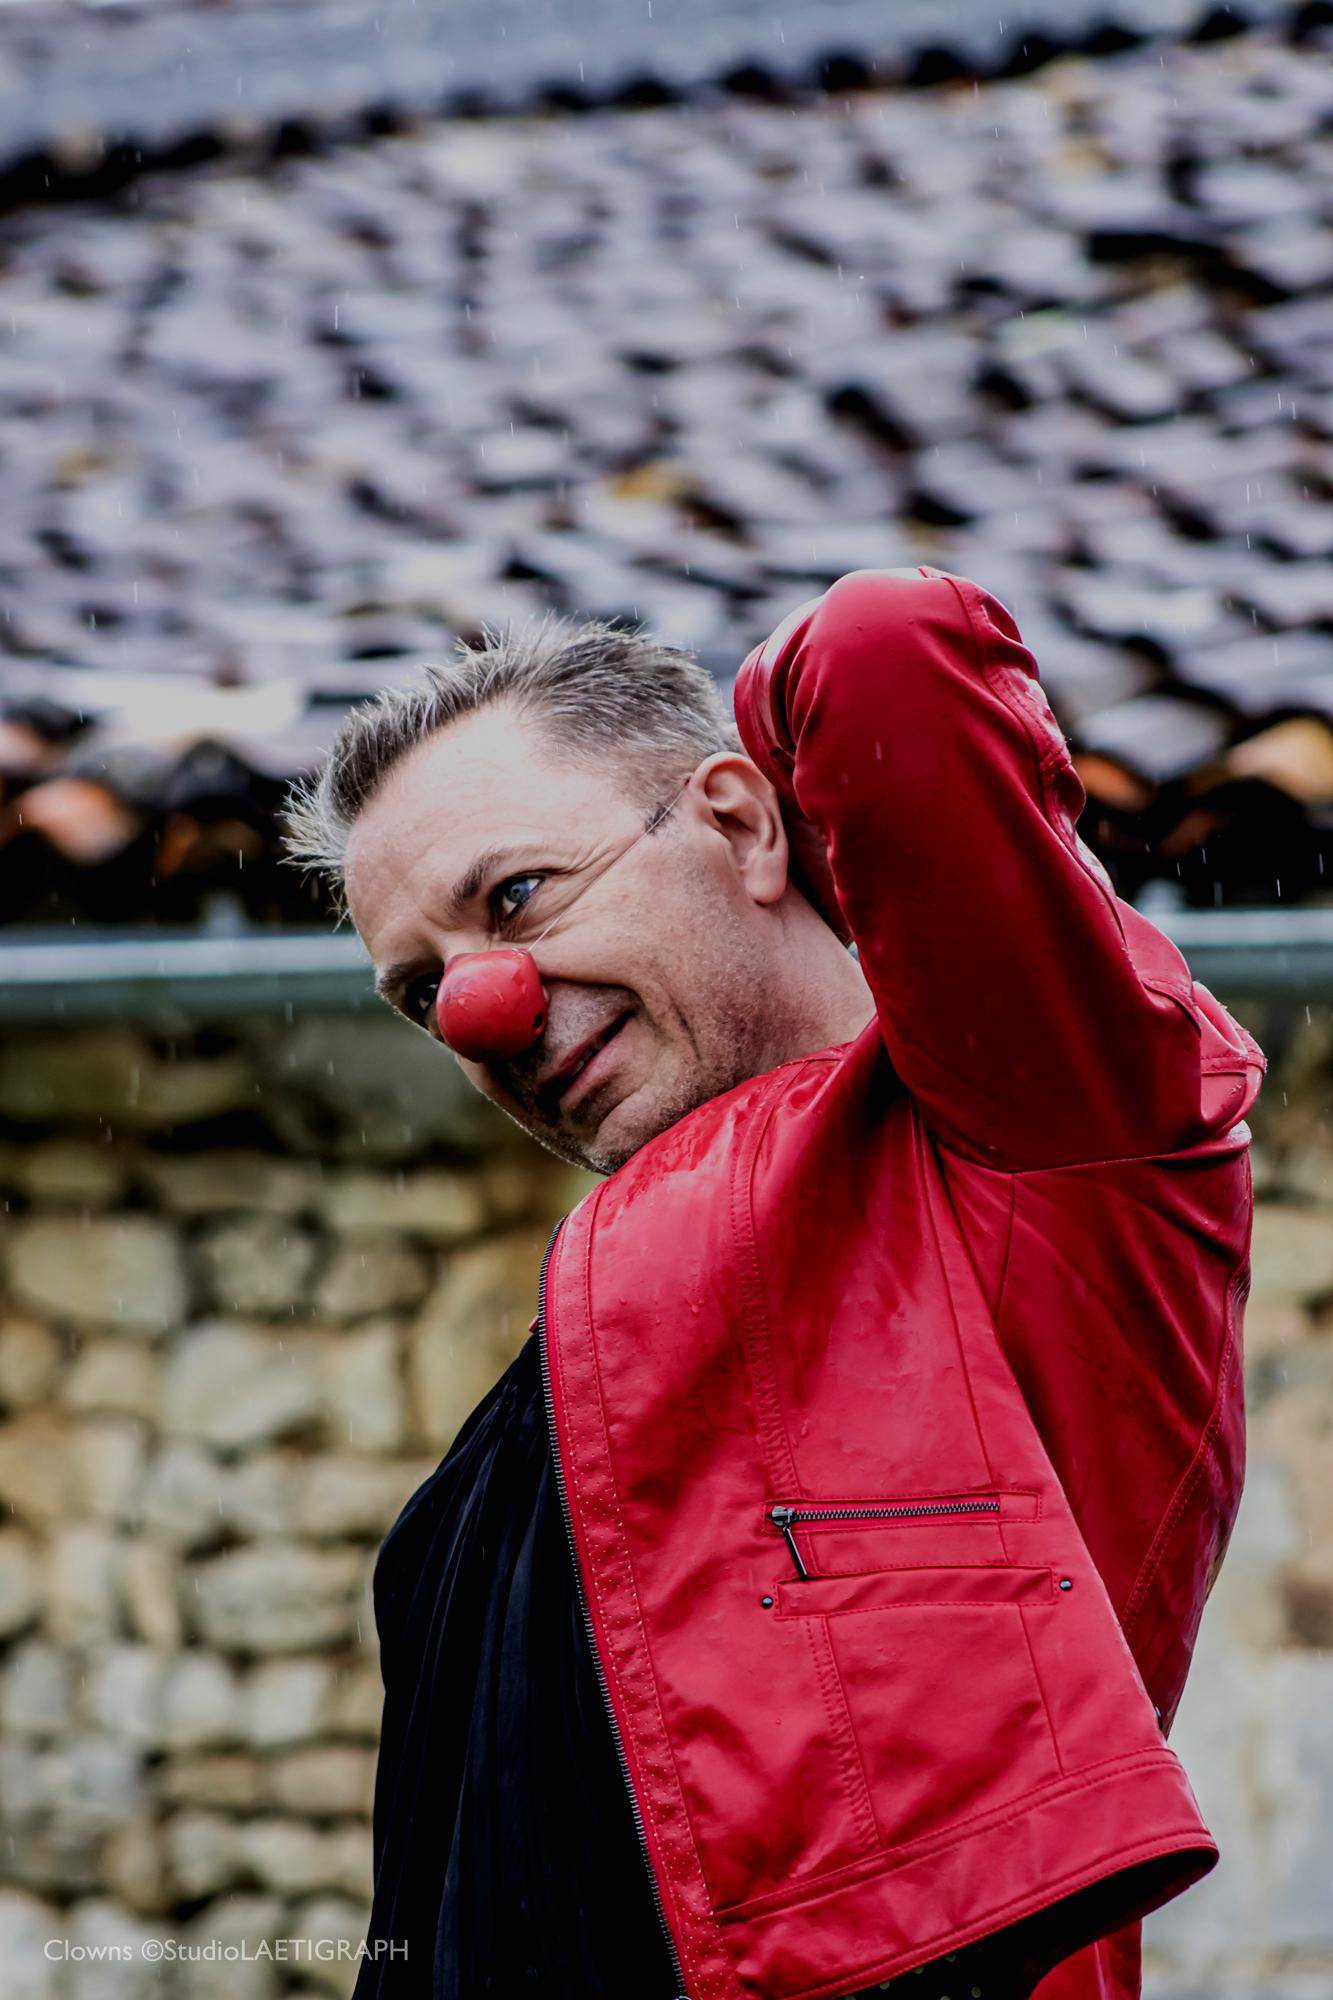 LMDCB21_clowns-39_1